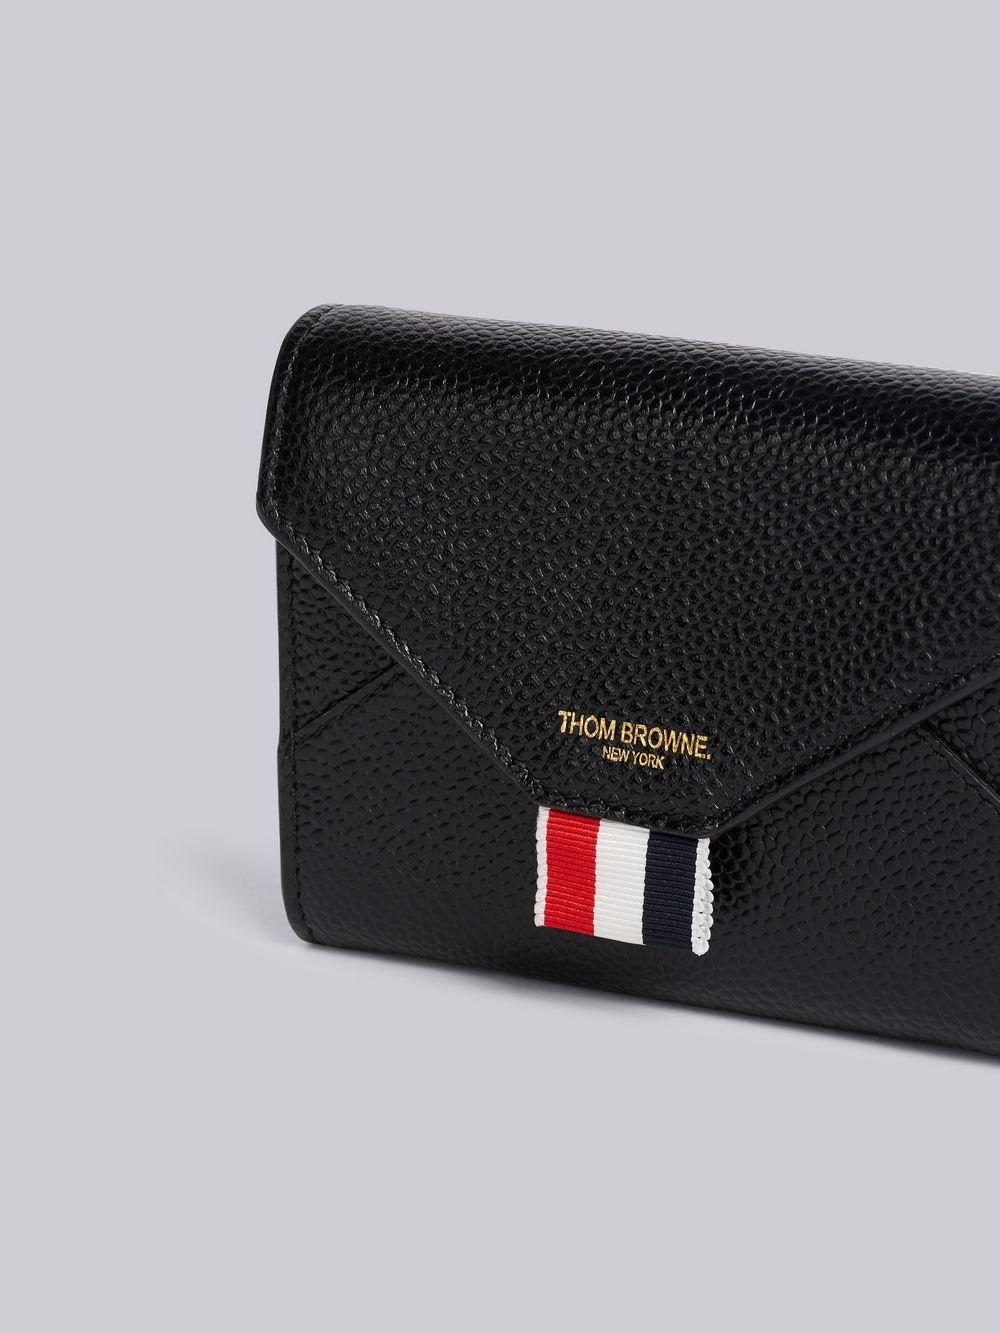 936d2bf1e51f Lyst - Thom Browne Pebbled Short Envelope Wallet in Black